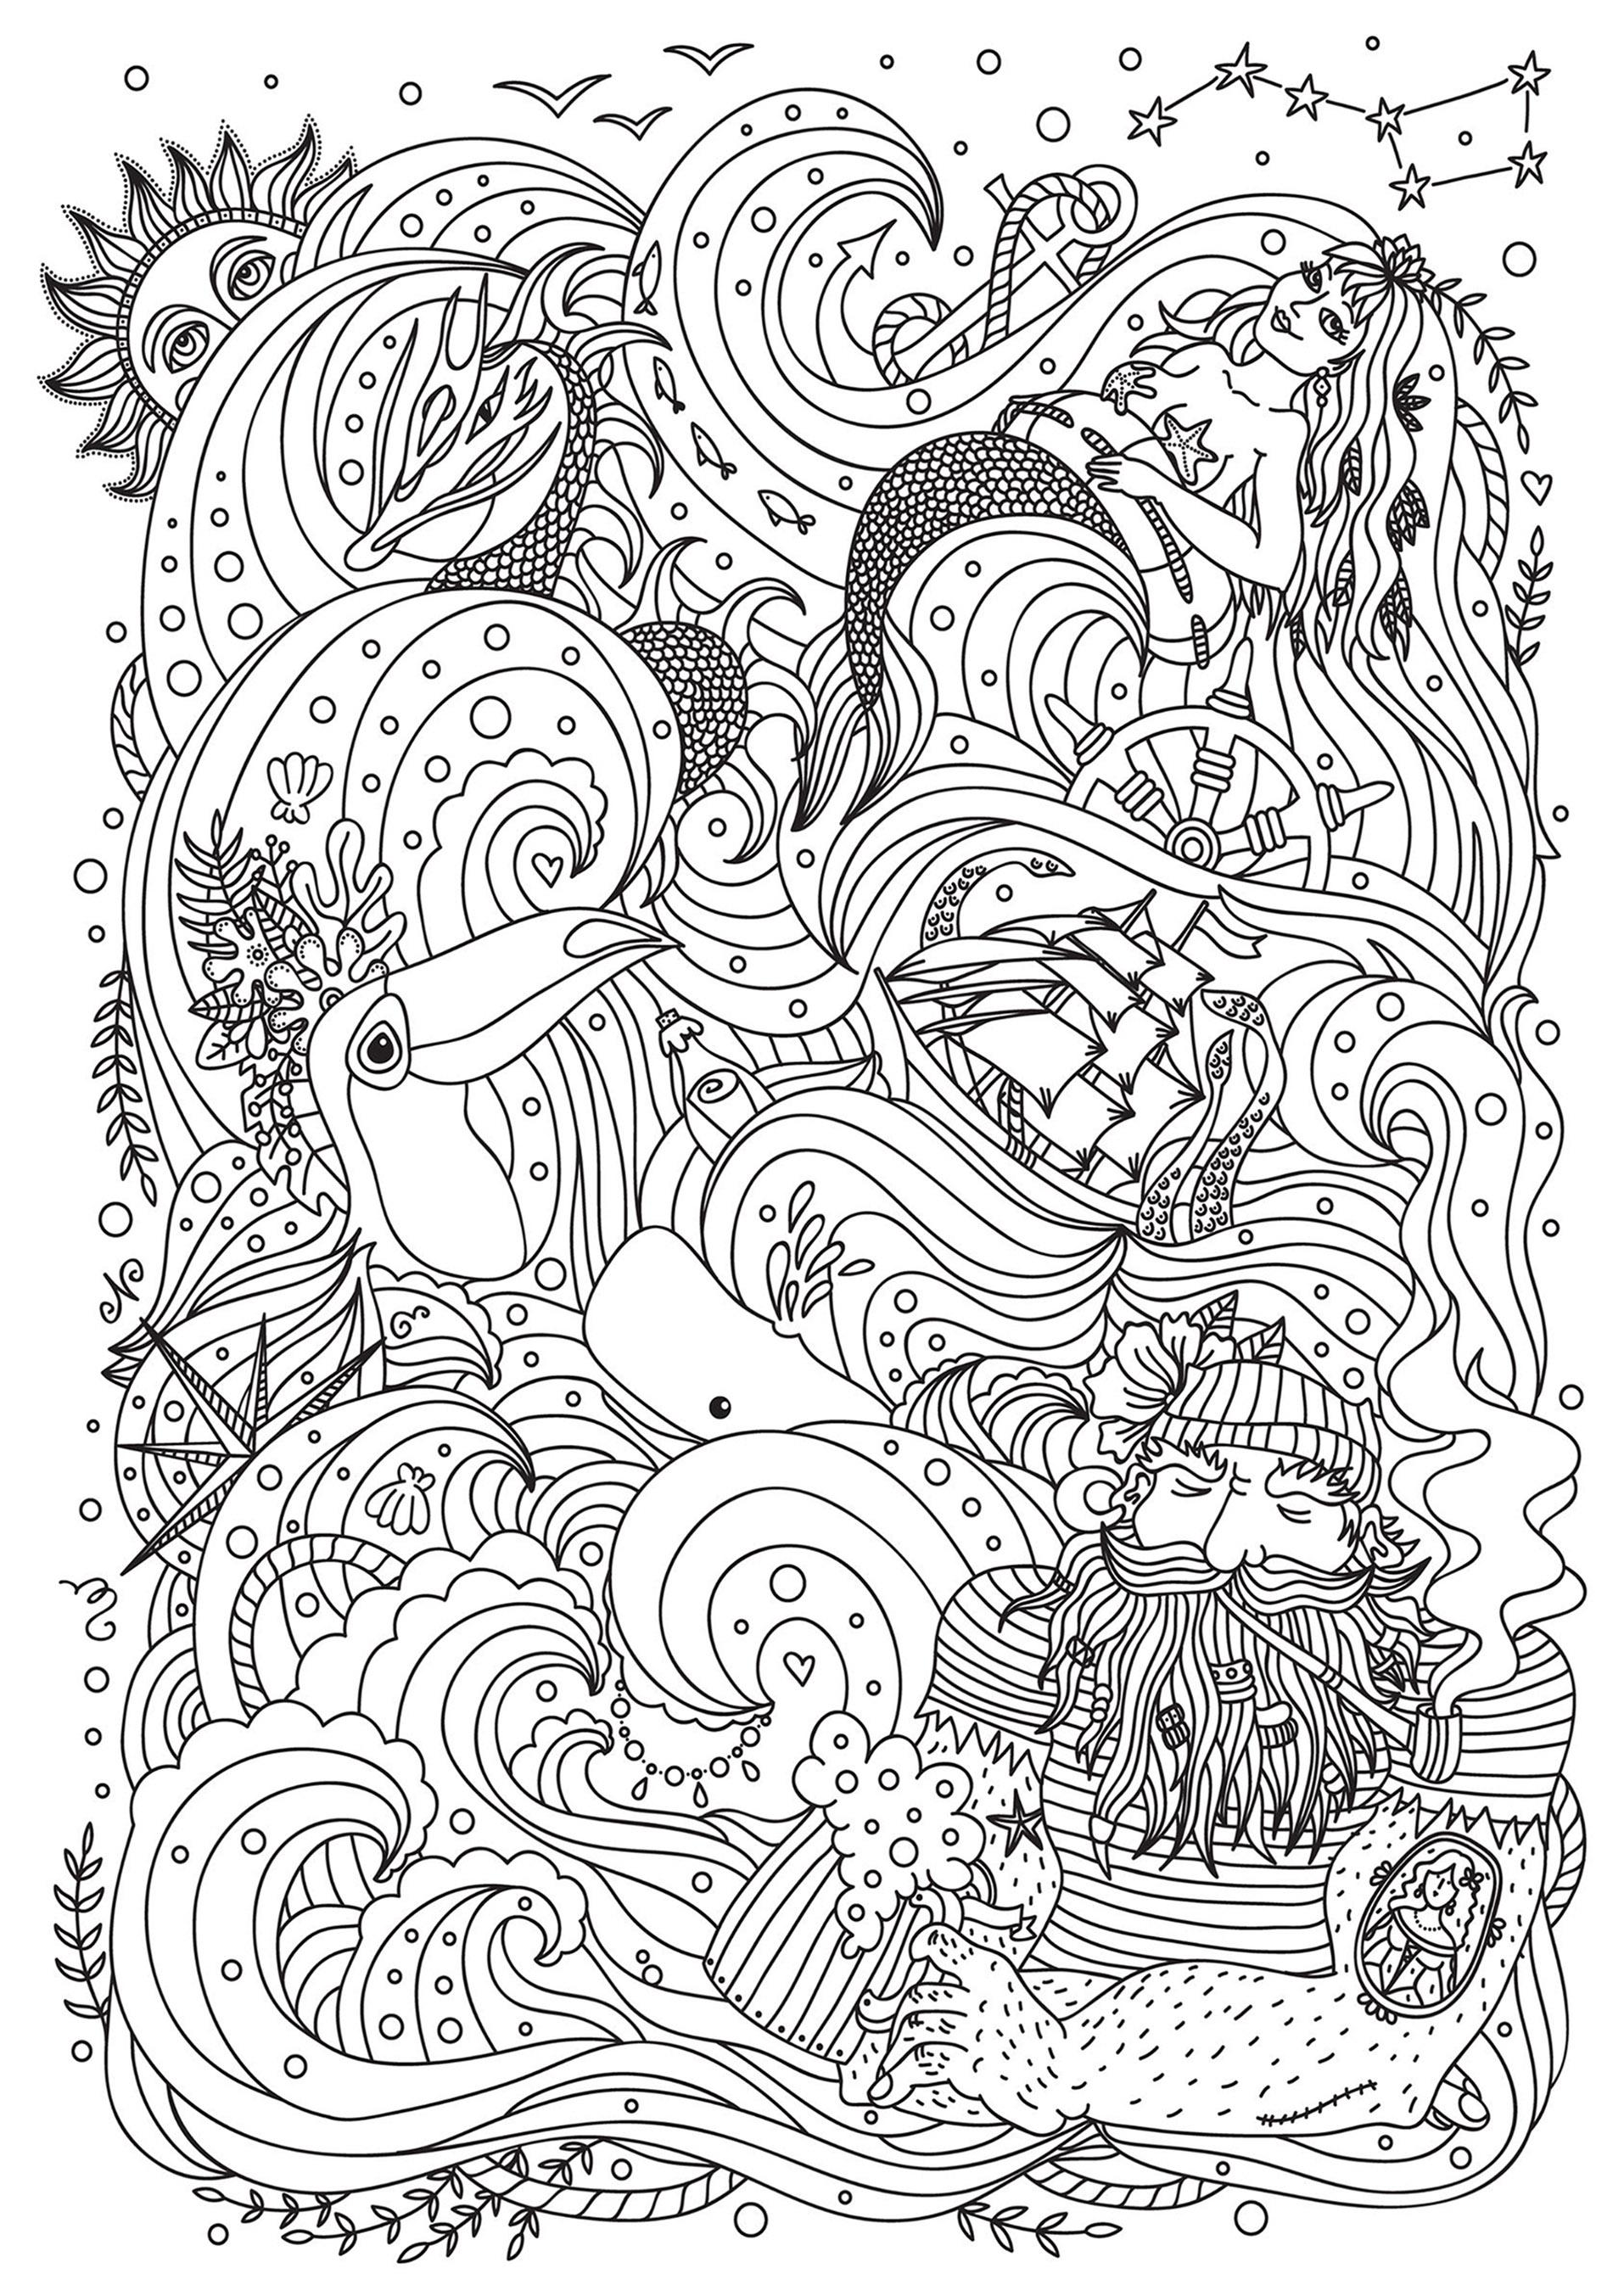 Sirenas 57202 Sirenas Disegni